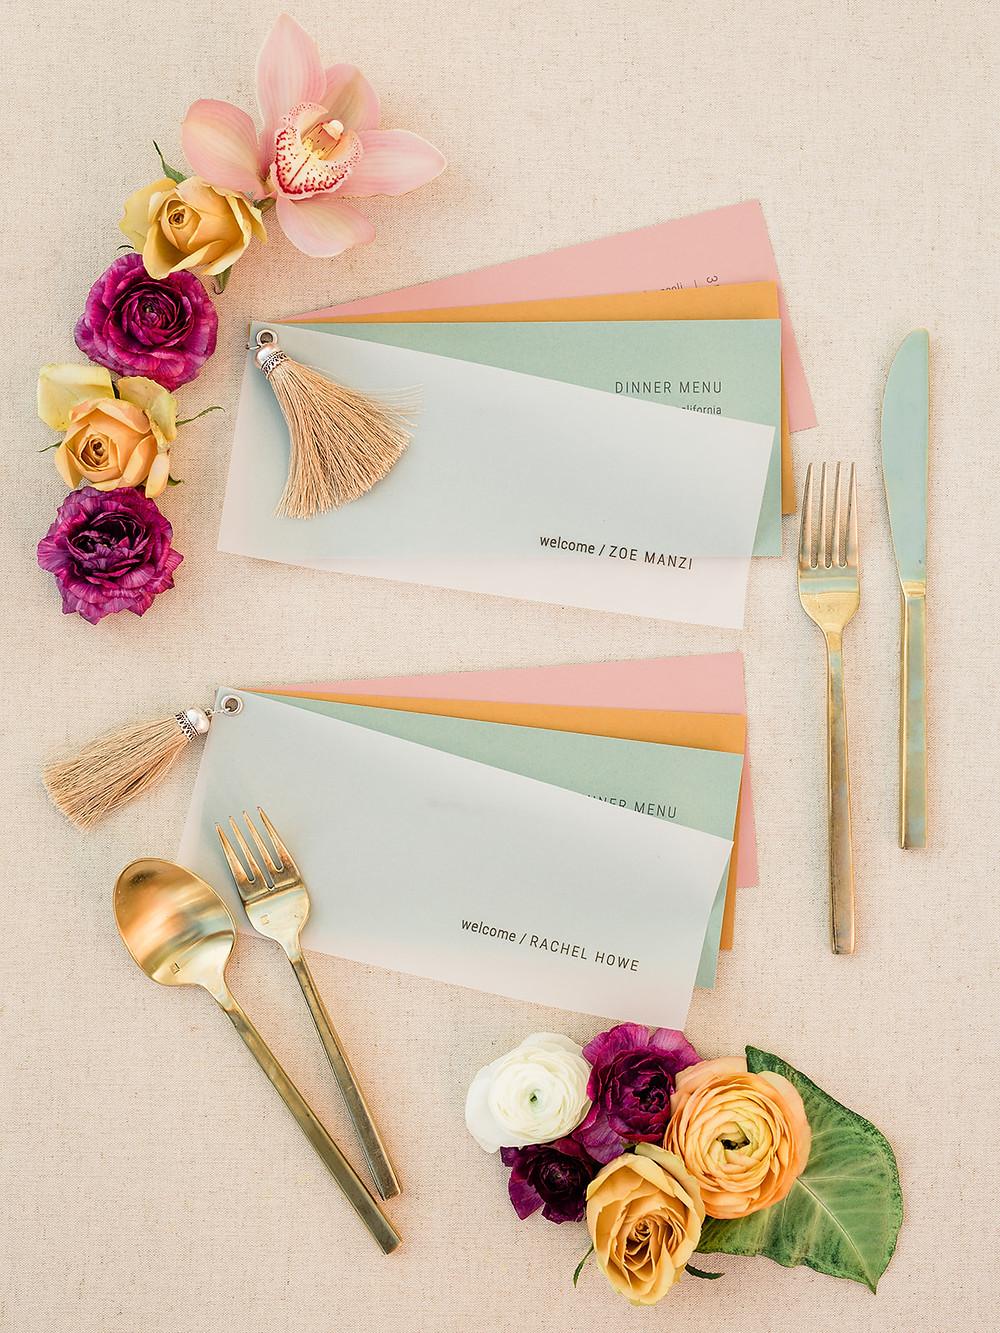 Modern Moroccan Desert Glam Editorial - LGBTQ Wedding Editoiral - Wedding Design Inspiration - Muted Desert Tones - Modern Glam Jungle Chic - Dinner menu design